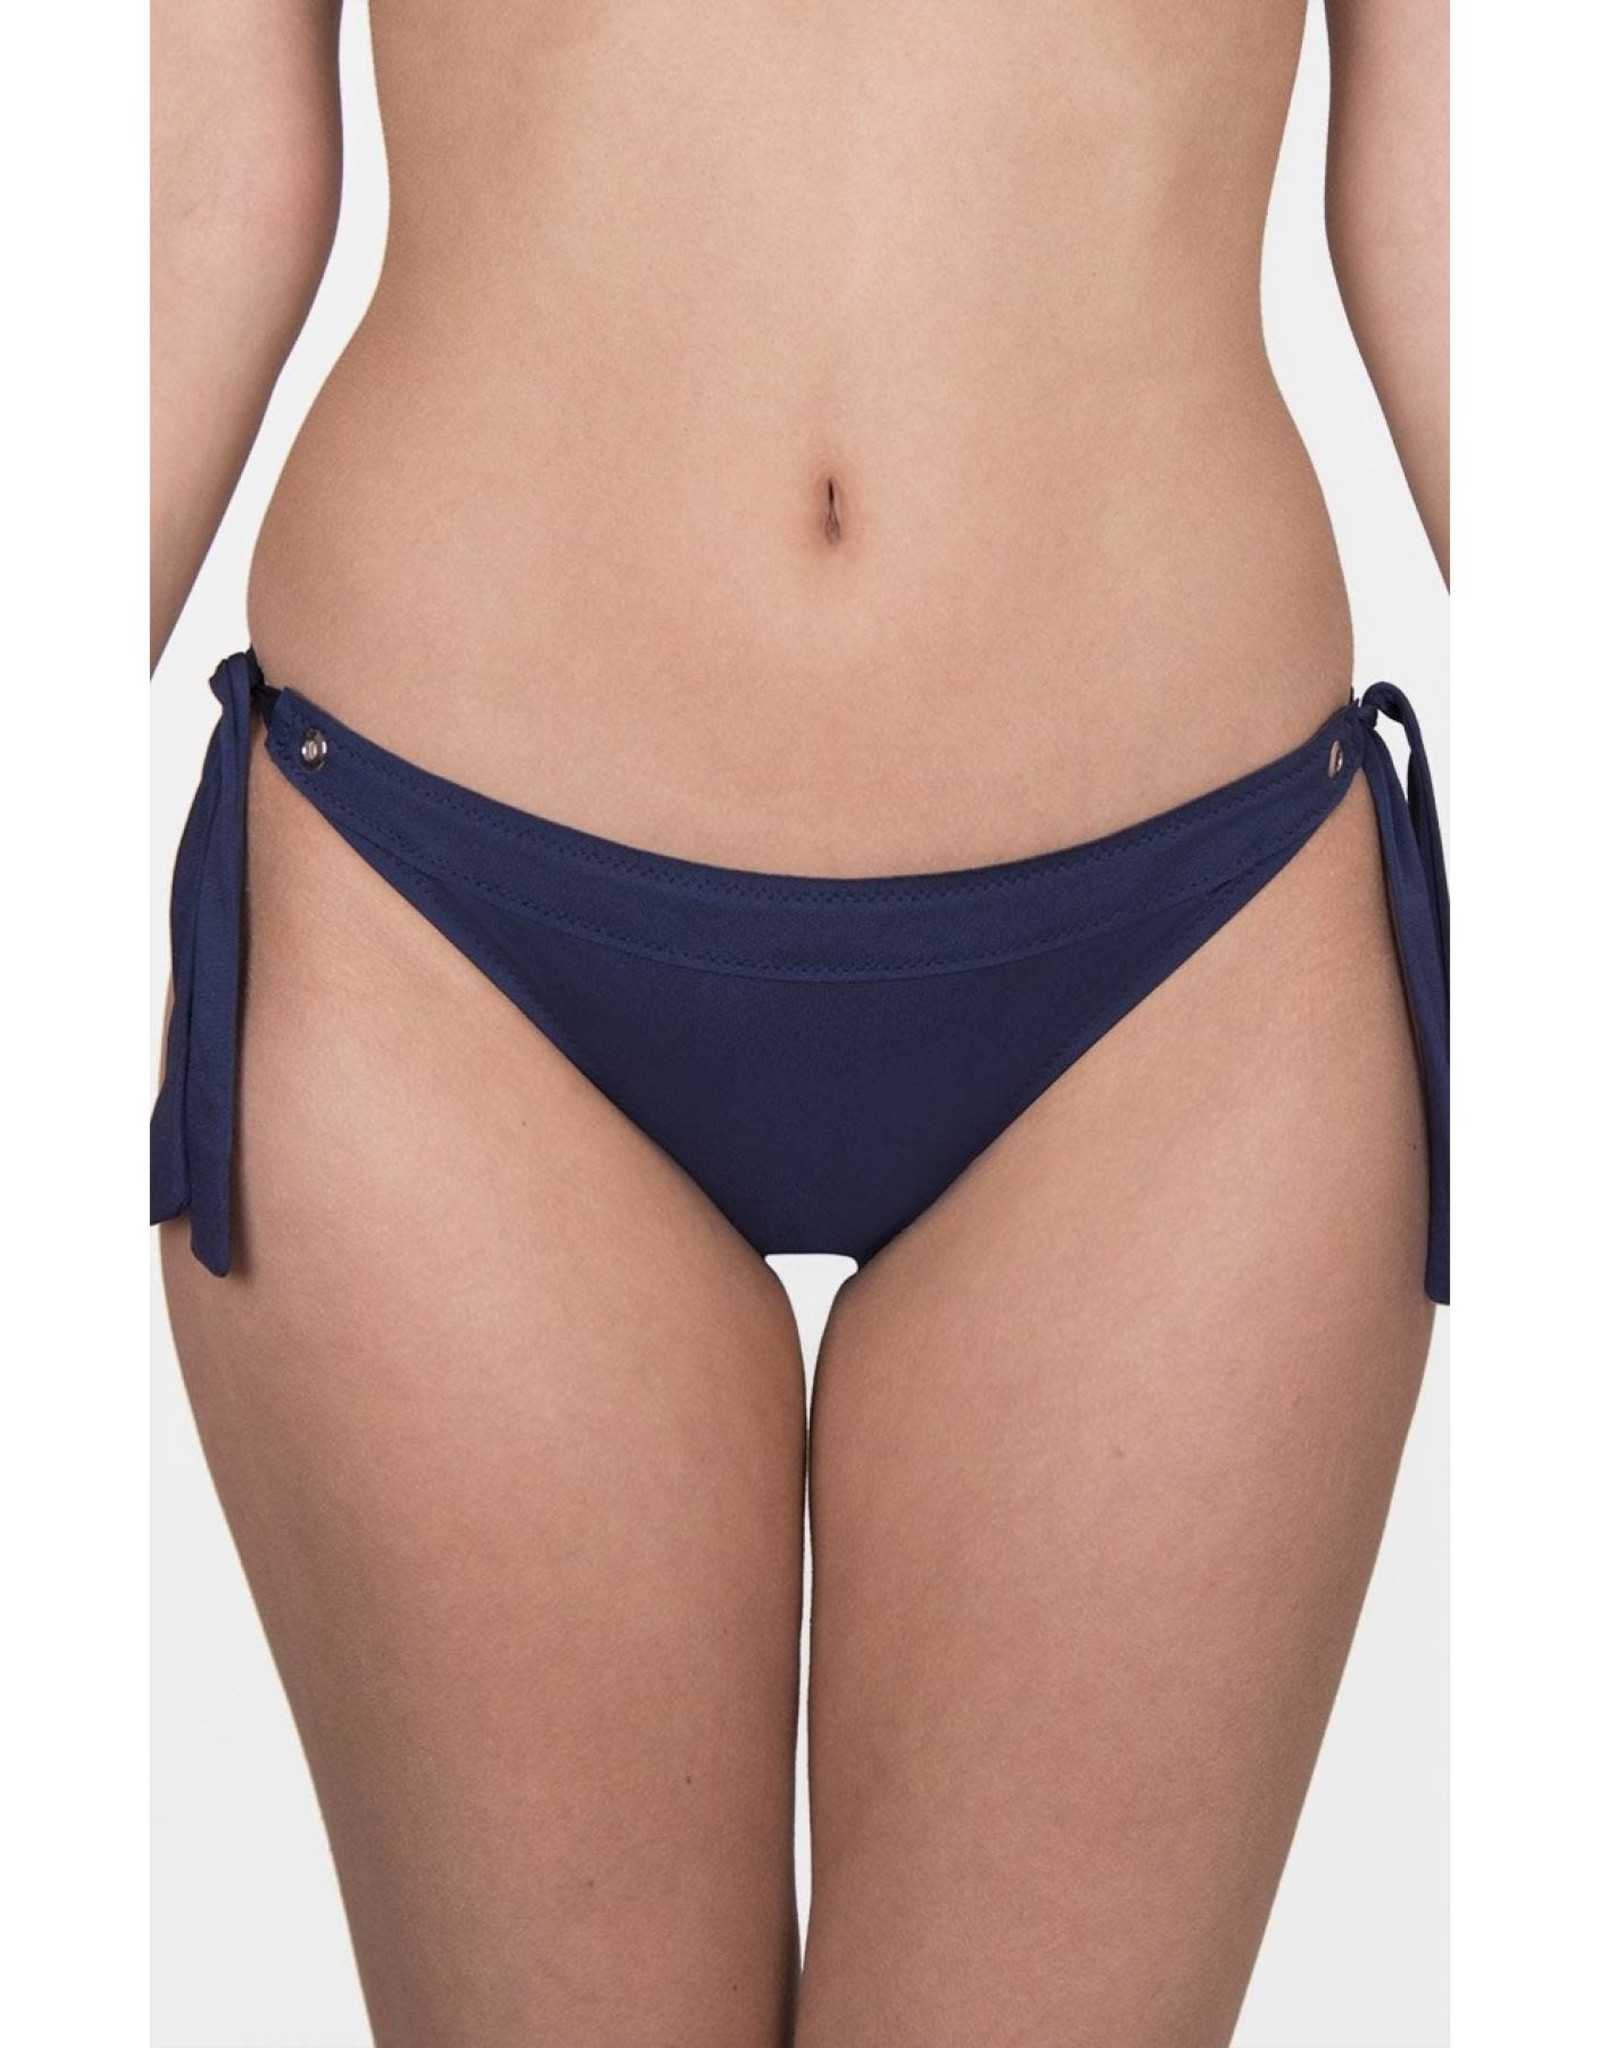 Shan Napoli Knotted Bikini Bottom